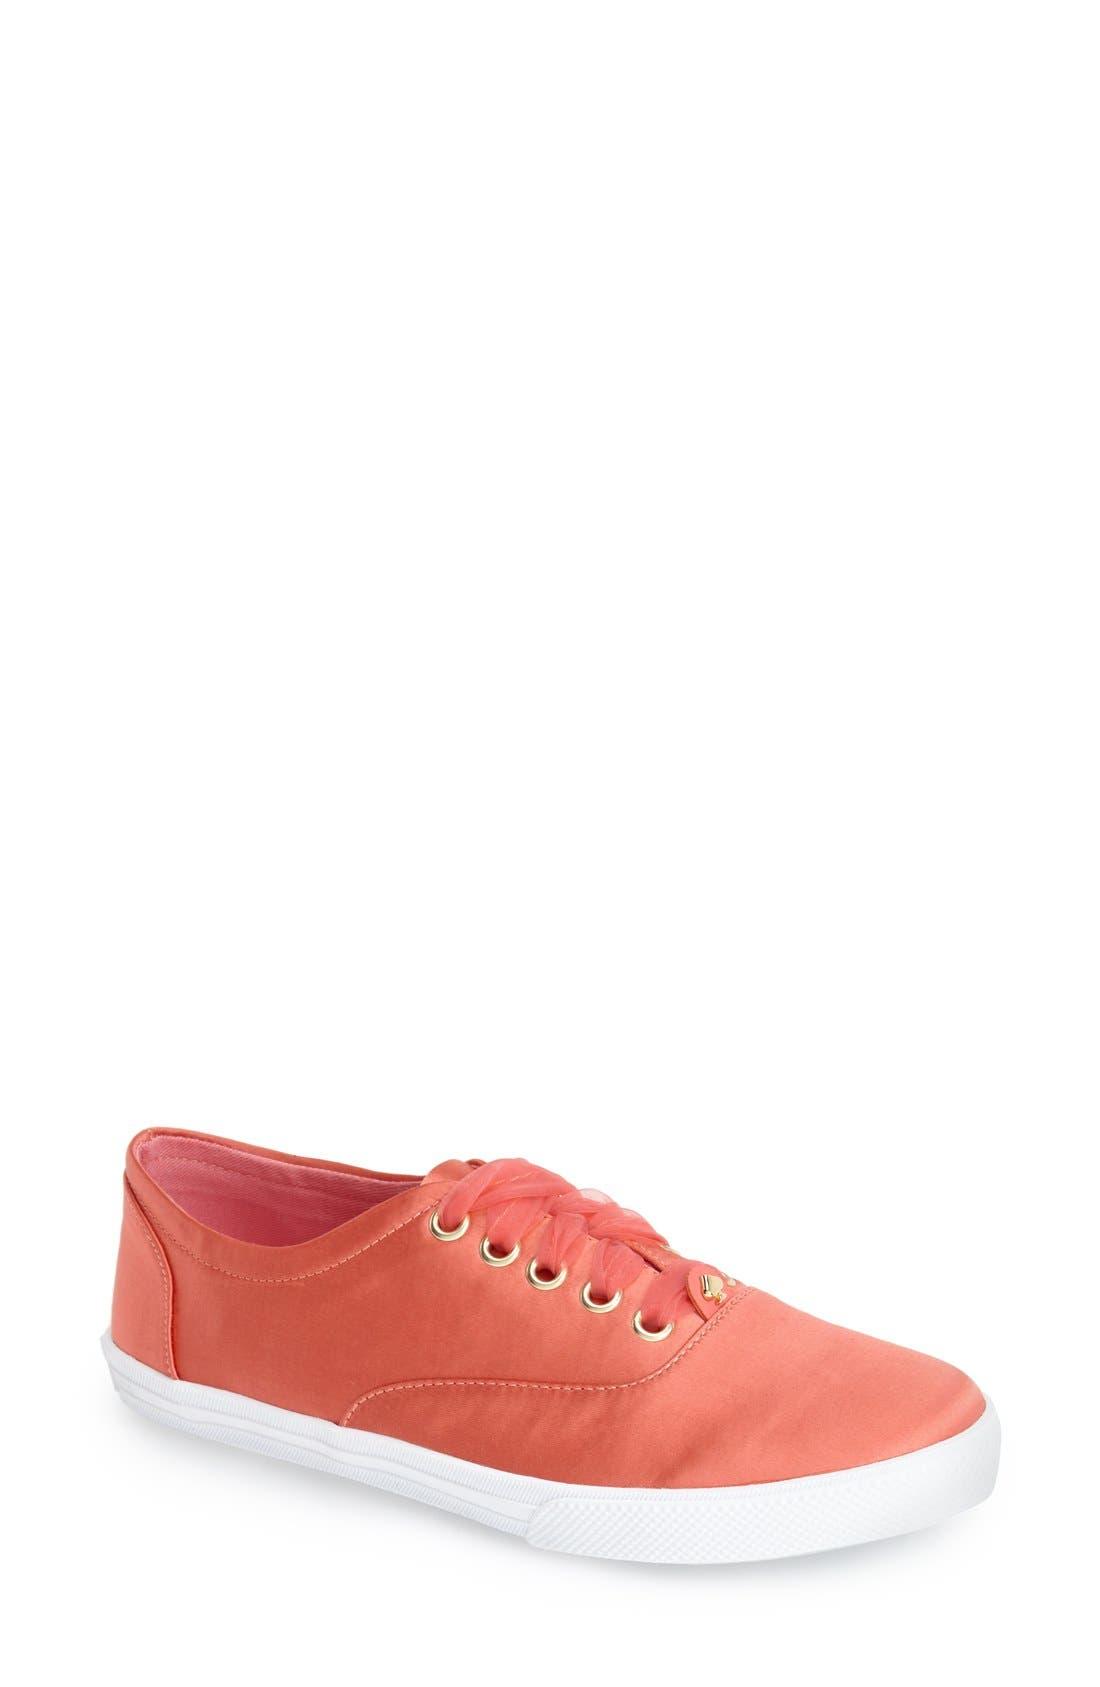 Main Image - kate spade new york 'lorana' satin lace-up sneaker (Women)